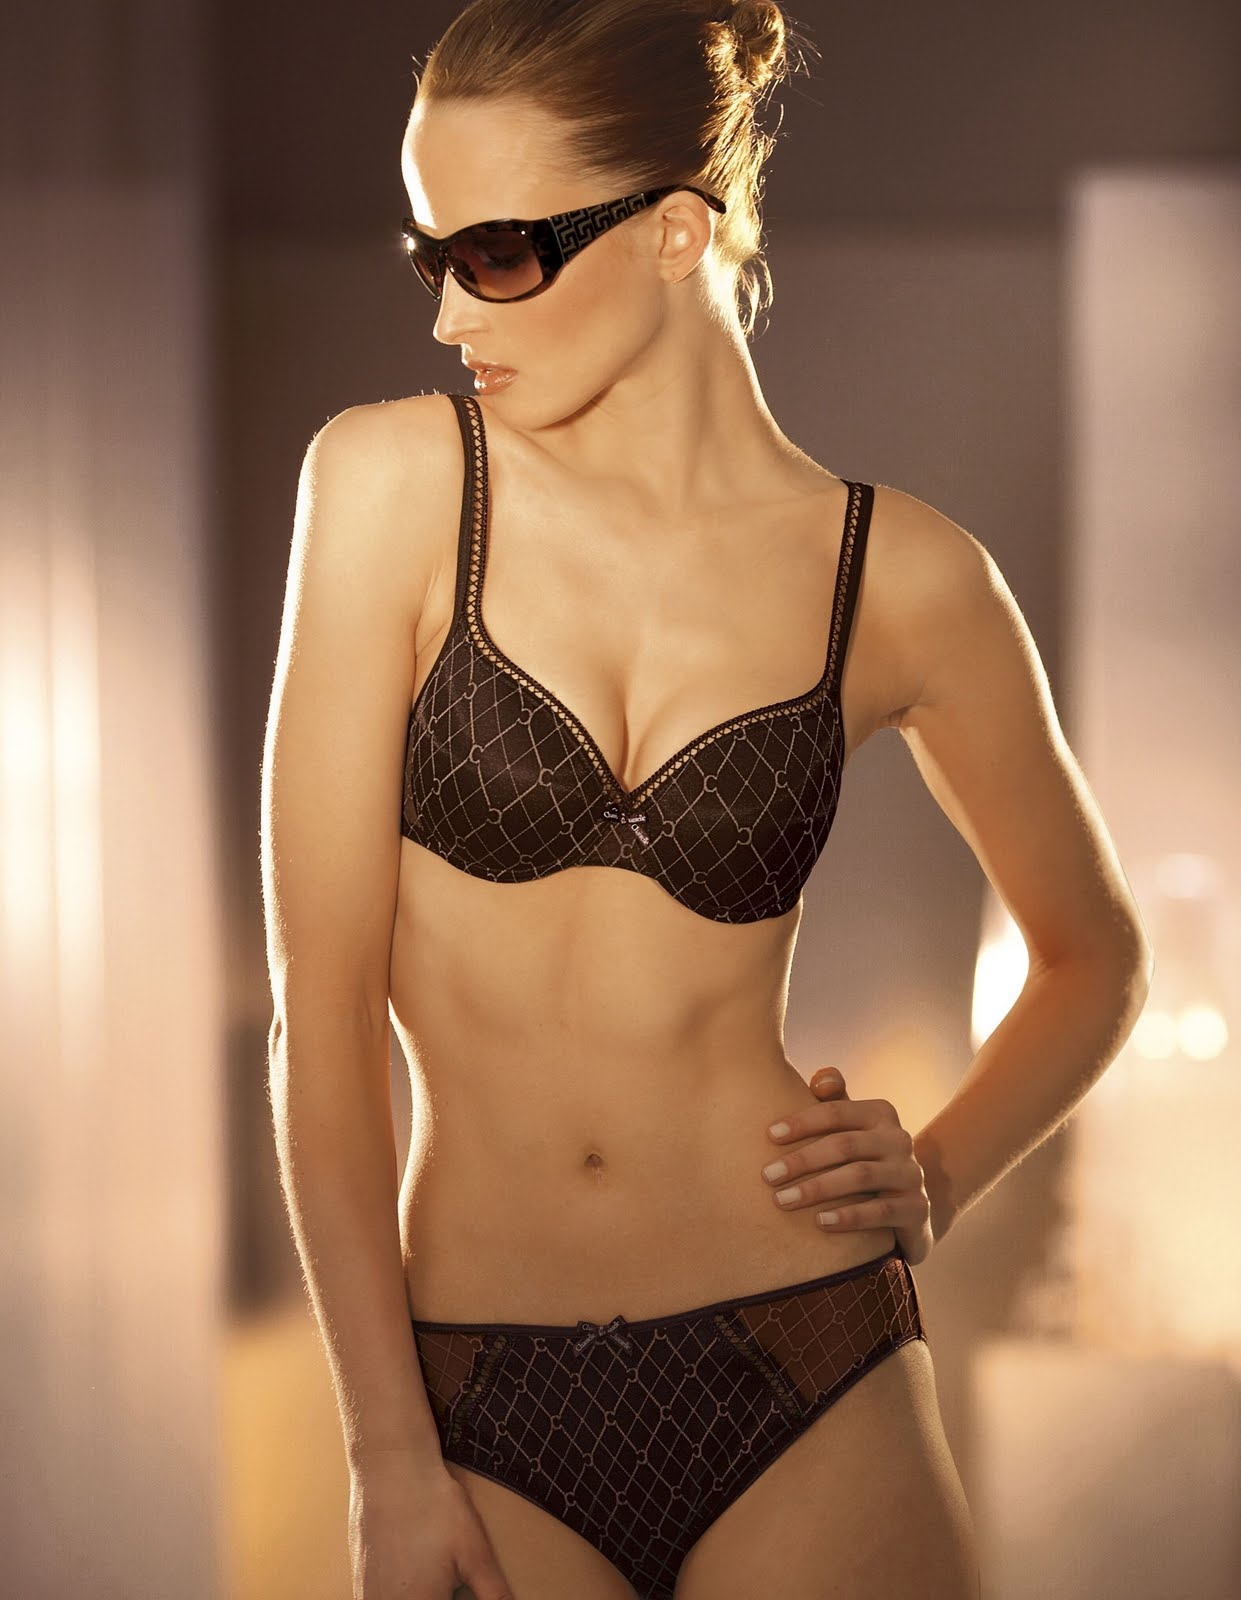 bikini bra style